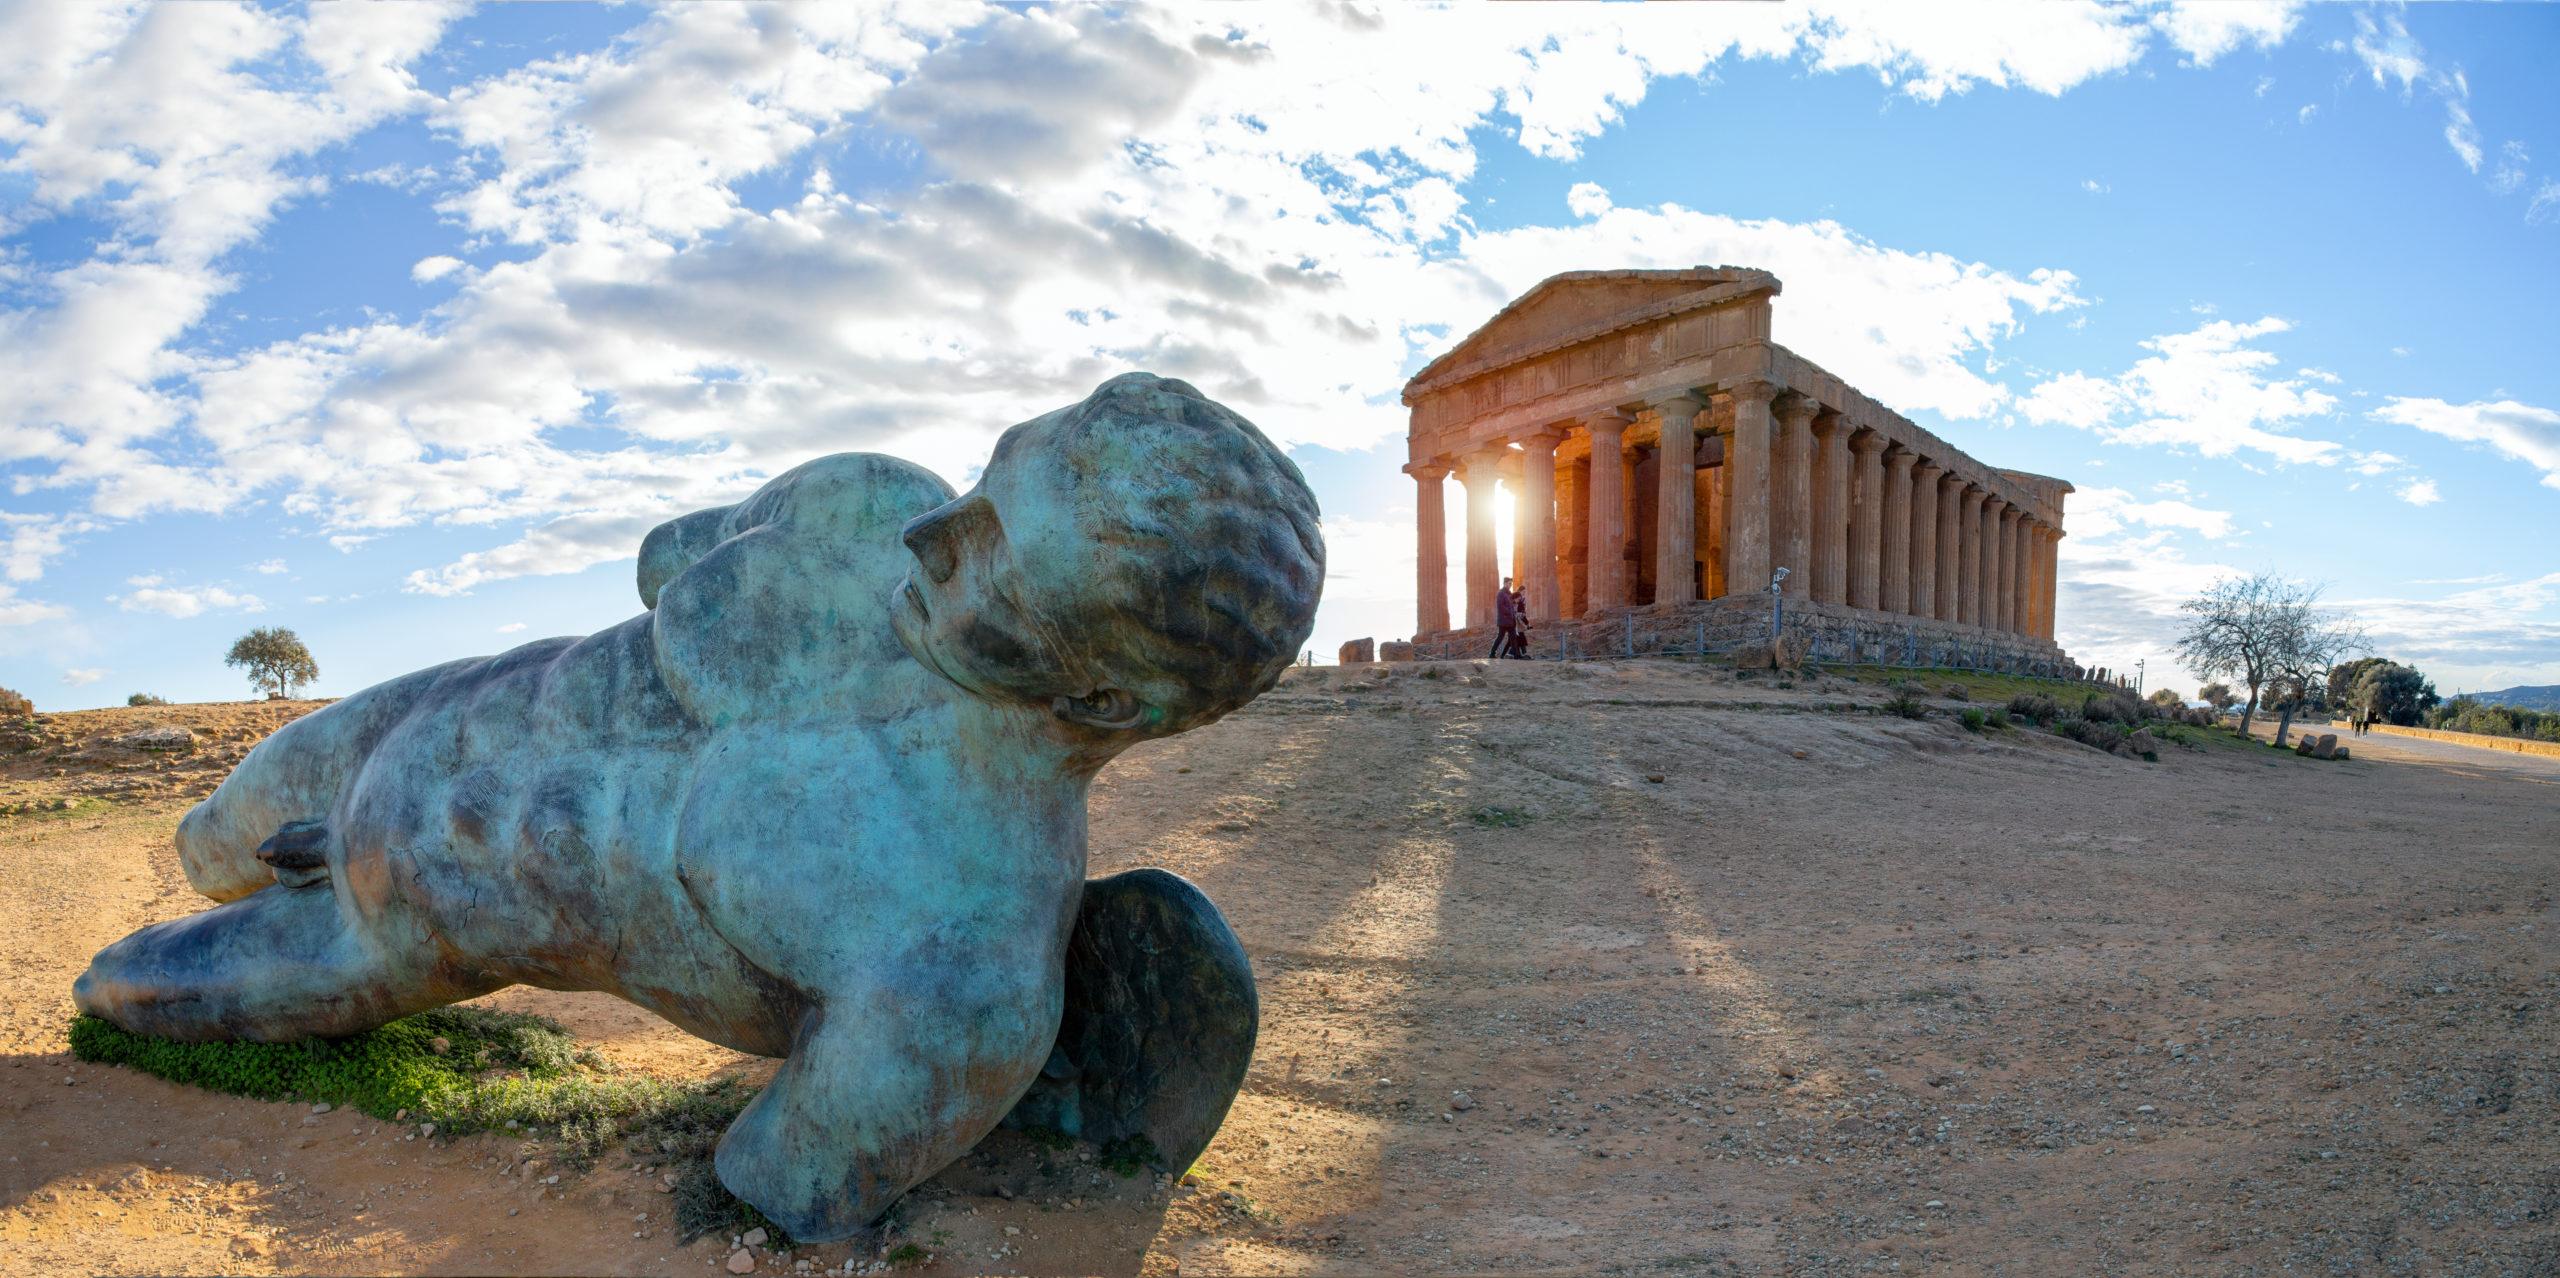 Agrigento, licencja: shutterstock/By Leo Salas Z